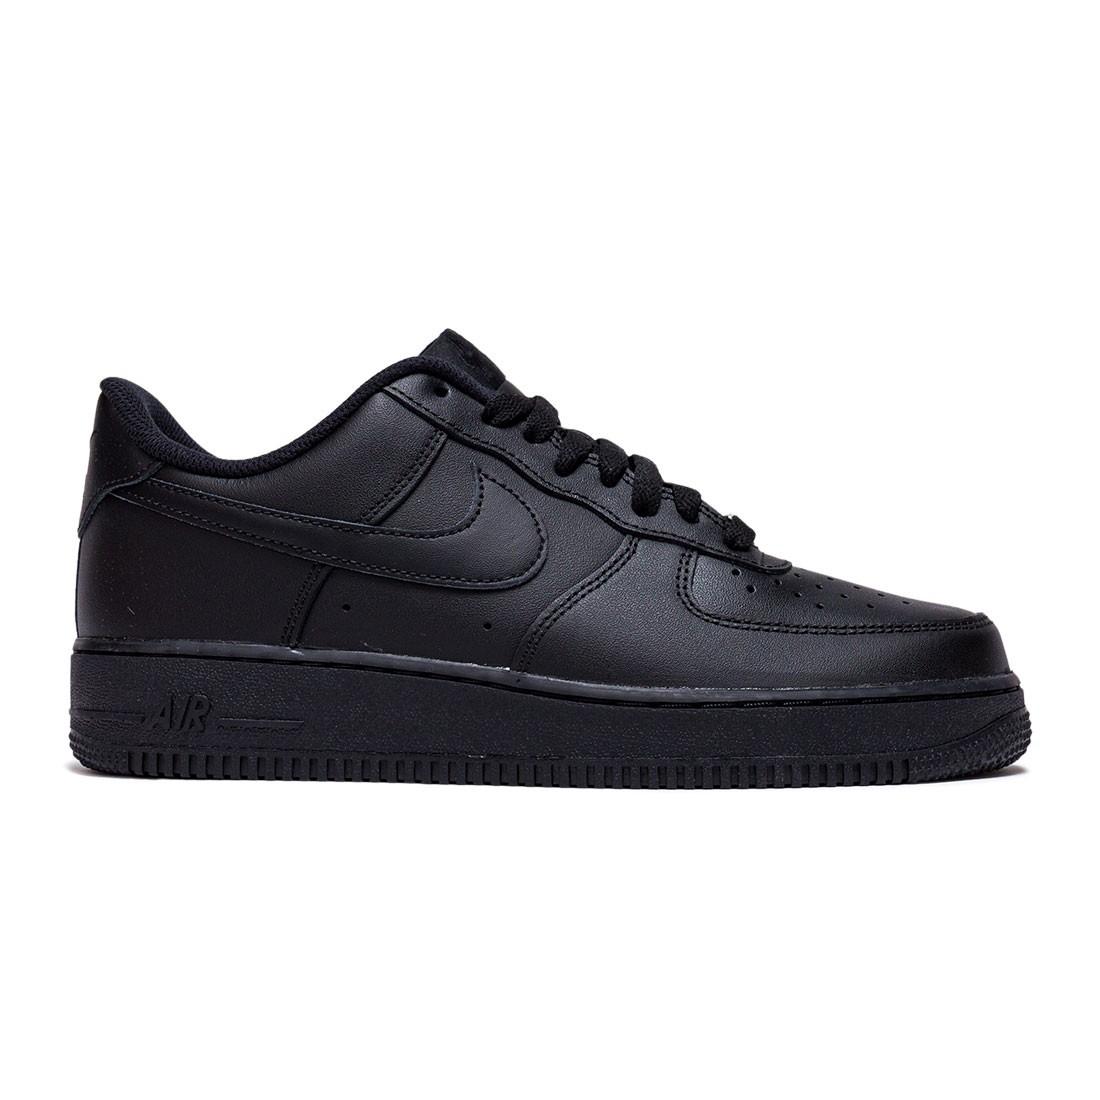 Nike Men Air Force 1 '07 (black / black)